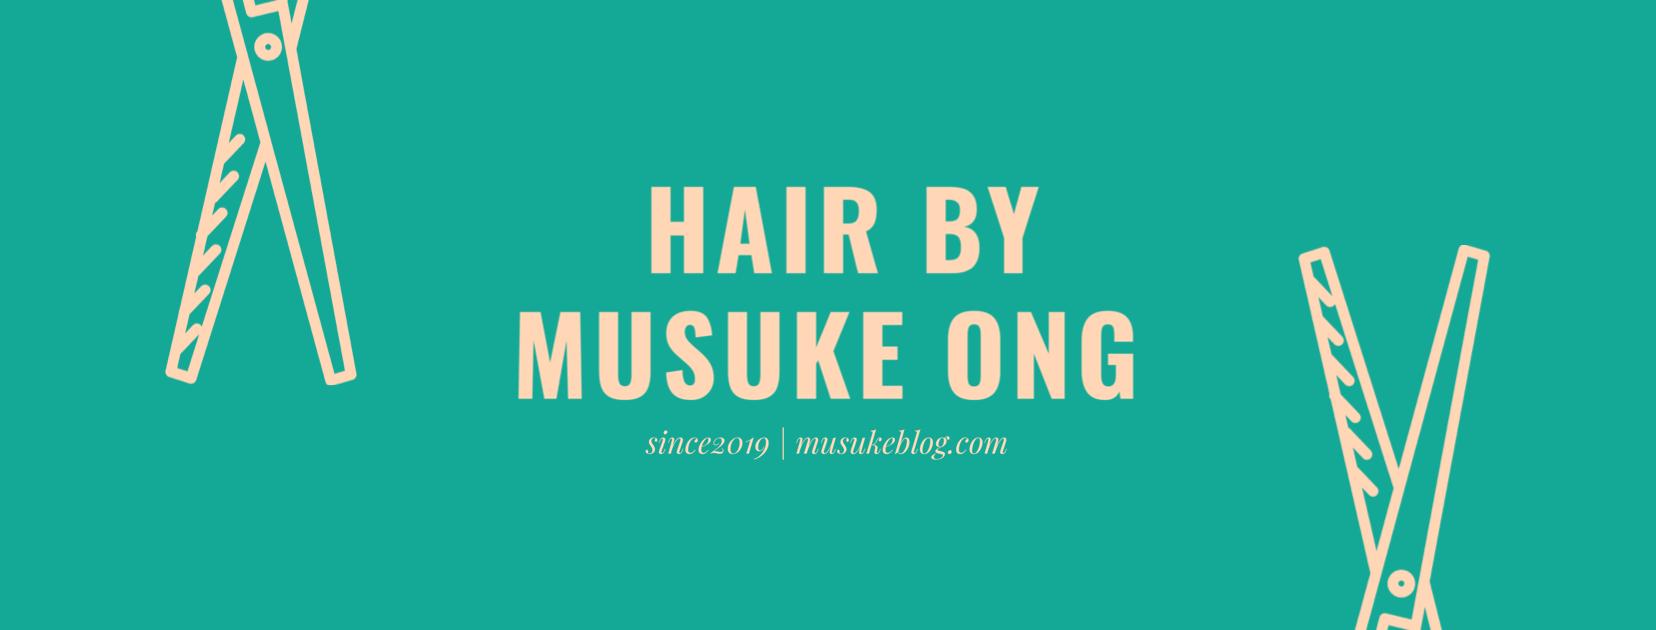 HAIR BY MUSUKE ONG